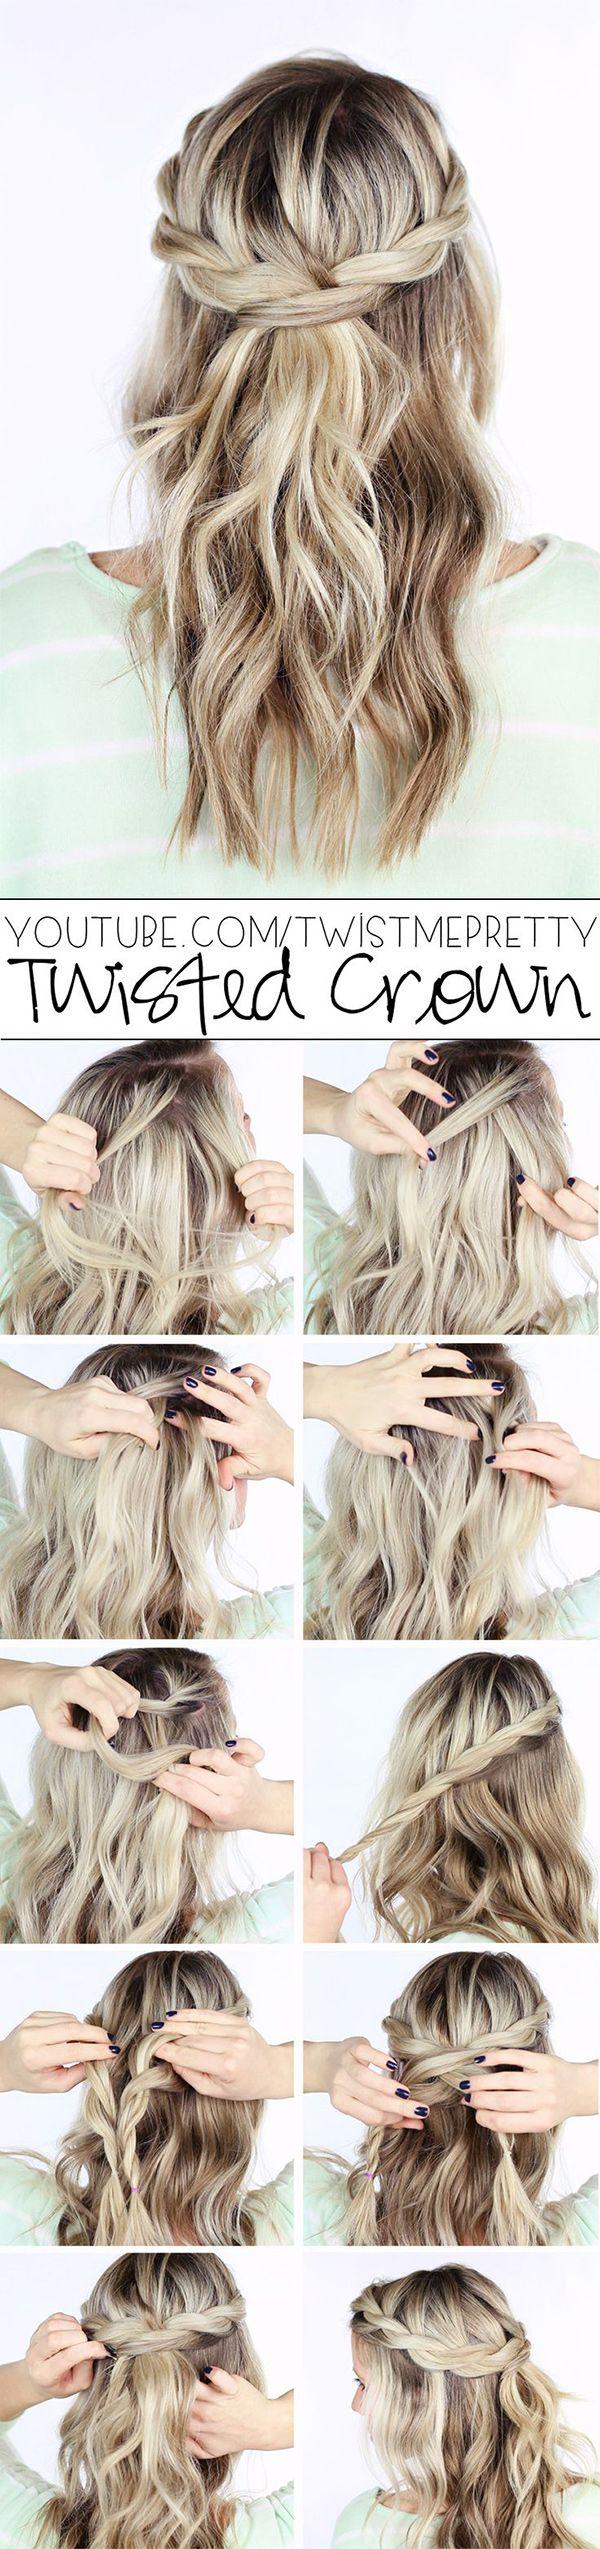 9 Boho Braid Tutorials For Cinderella Inspired Hair  Gurl.com